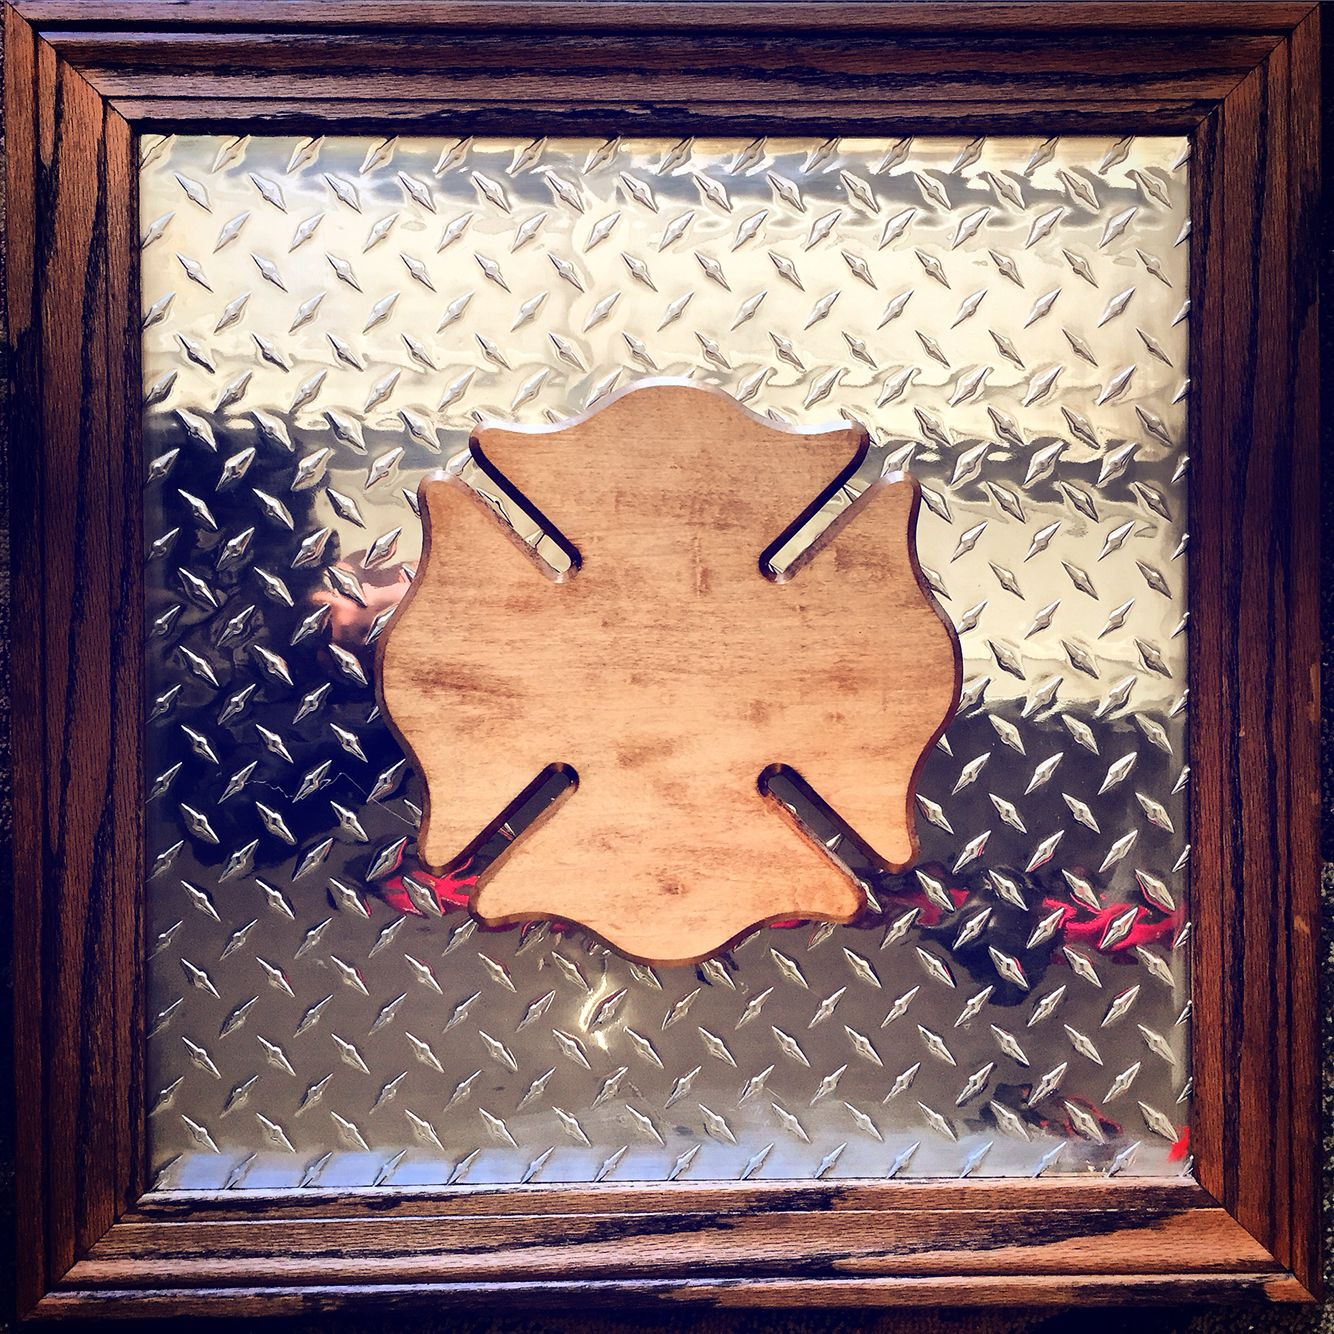 2 x 2 diamond plate plaque with walnut trim and wooden maltese 2 x 2 diamond plate plaque with walnut trim and wooden maltese cross heroplaques jeuxipadfo Choice Image